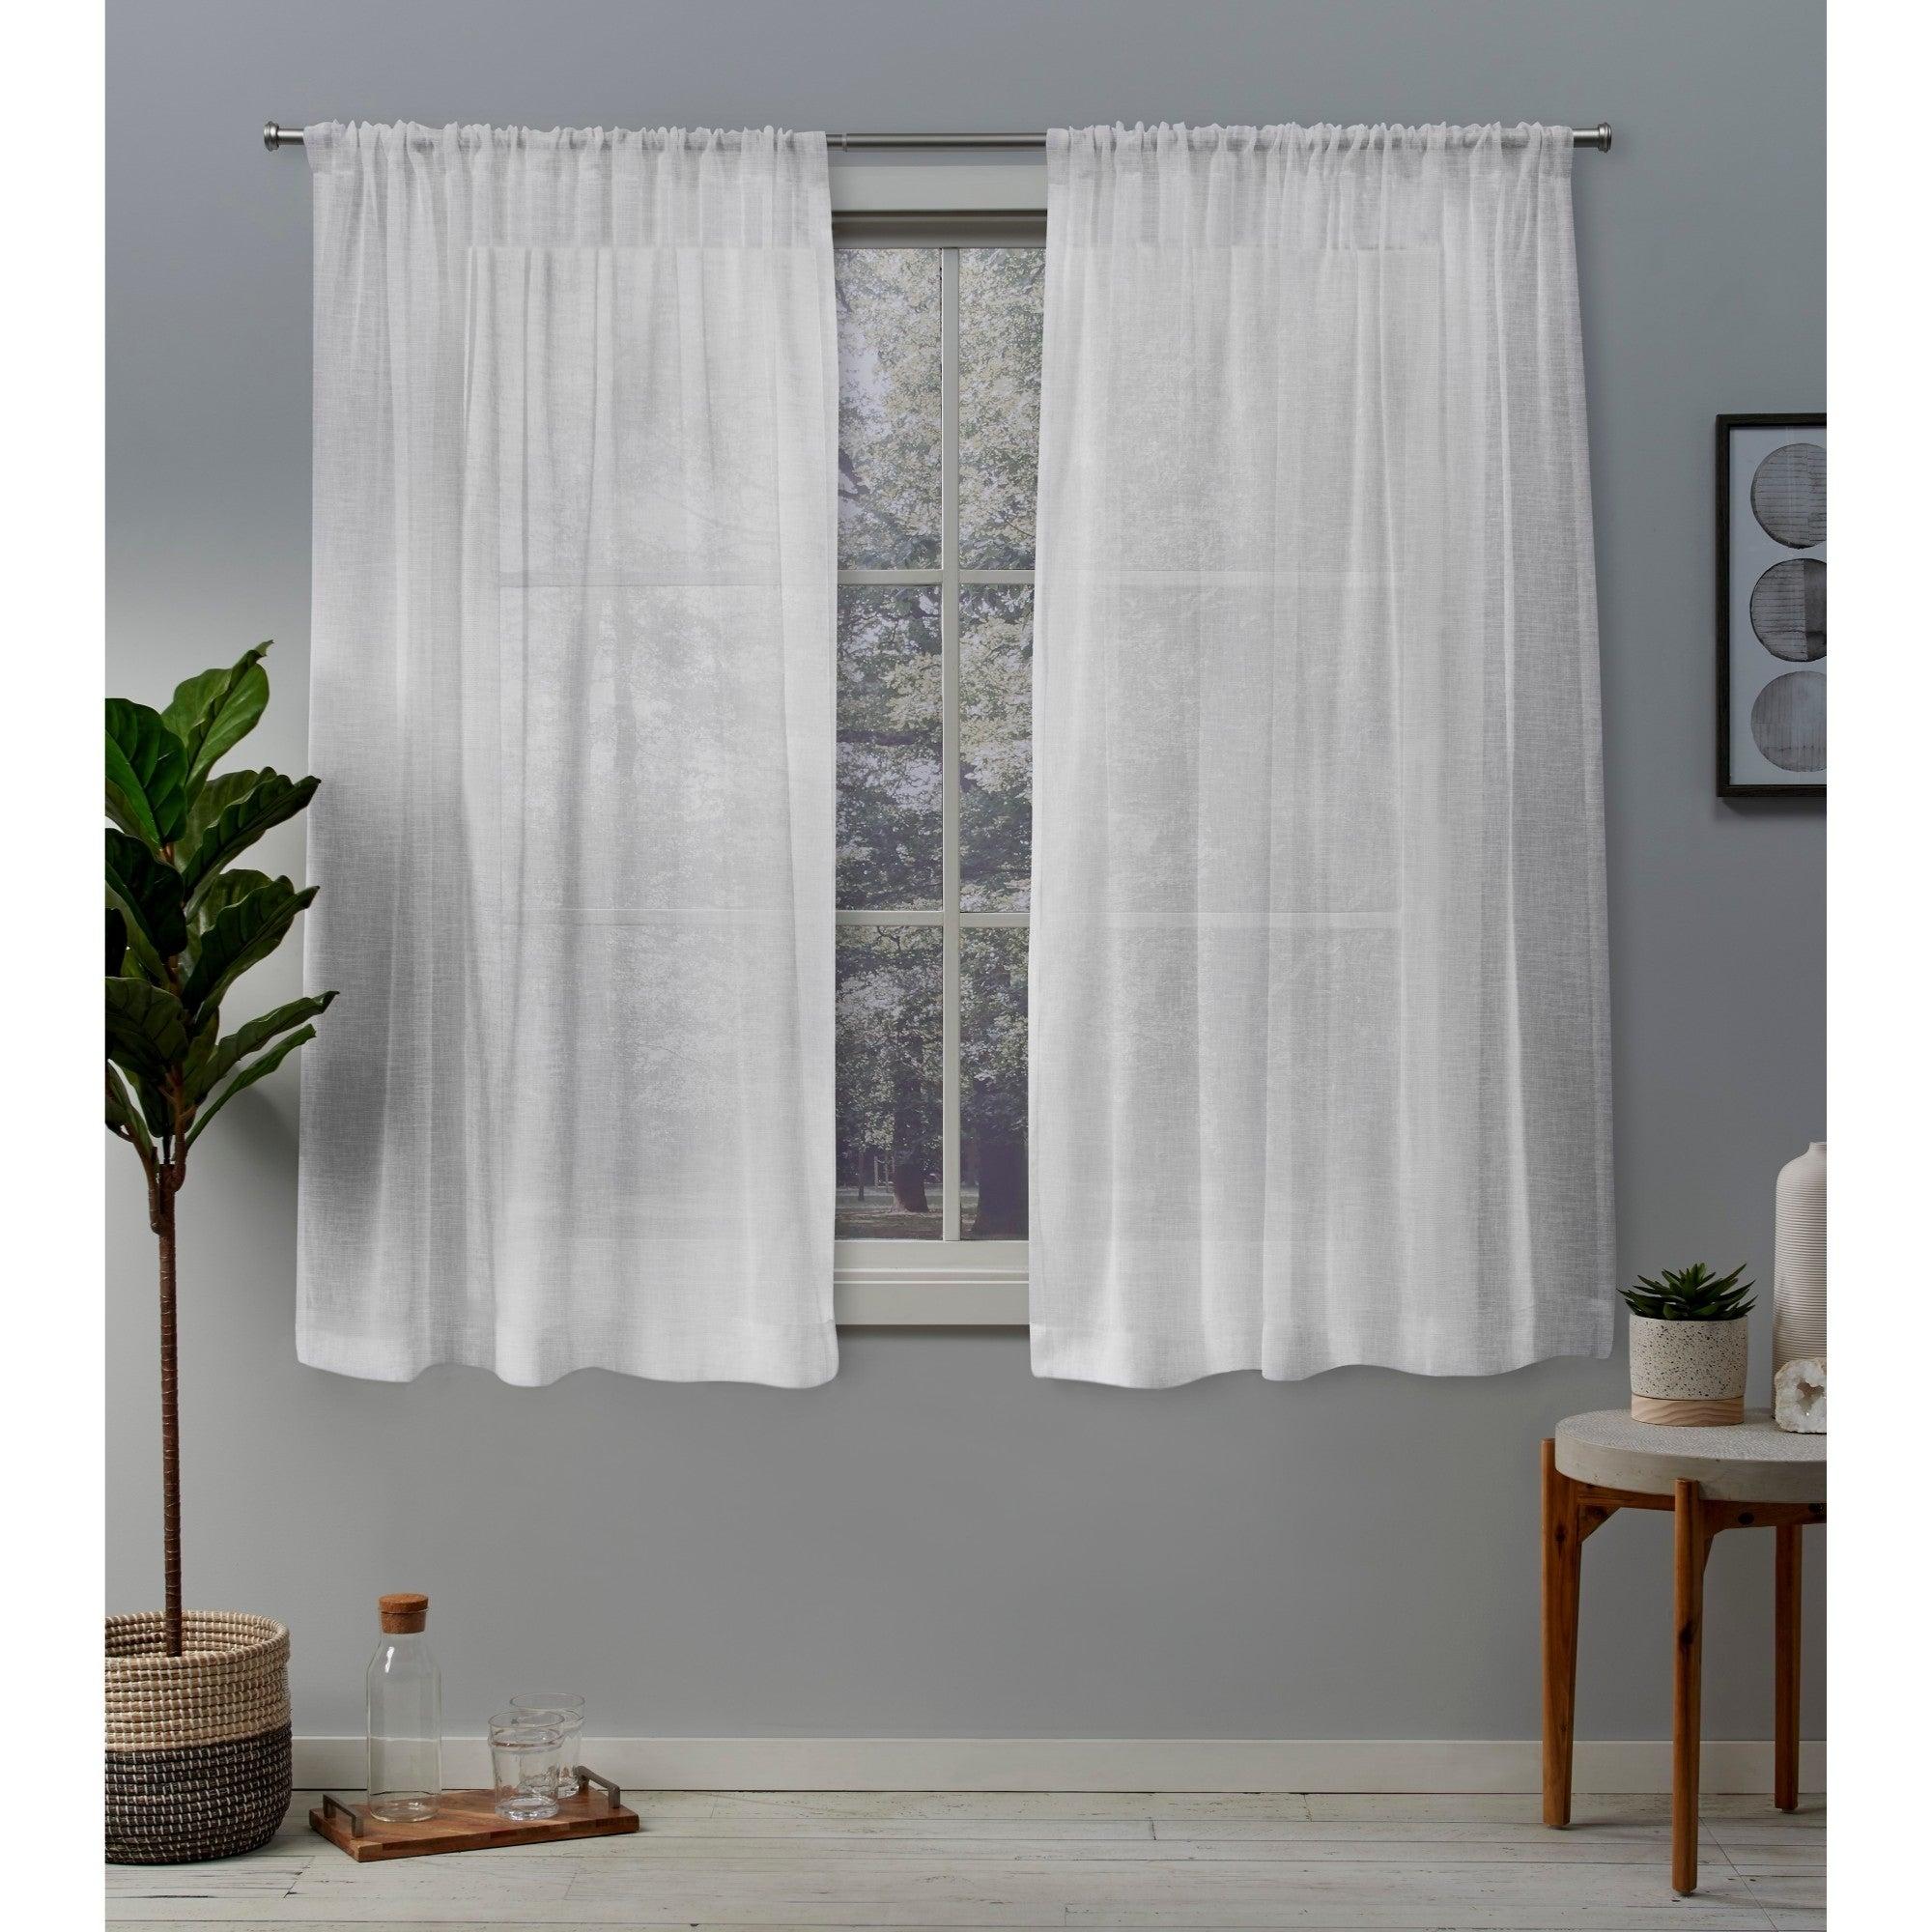 Ati Home Belgian Sheer Window Curtain Panel Pair With Rod Pocket Regarding Belgian Sheer Window Curtain Panel Pairs With Rod Pocket (View 5 of 20)